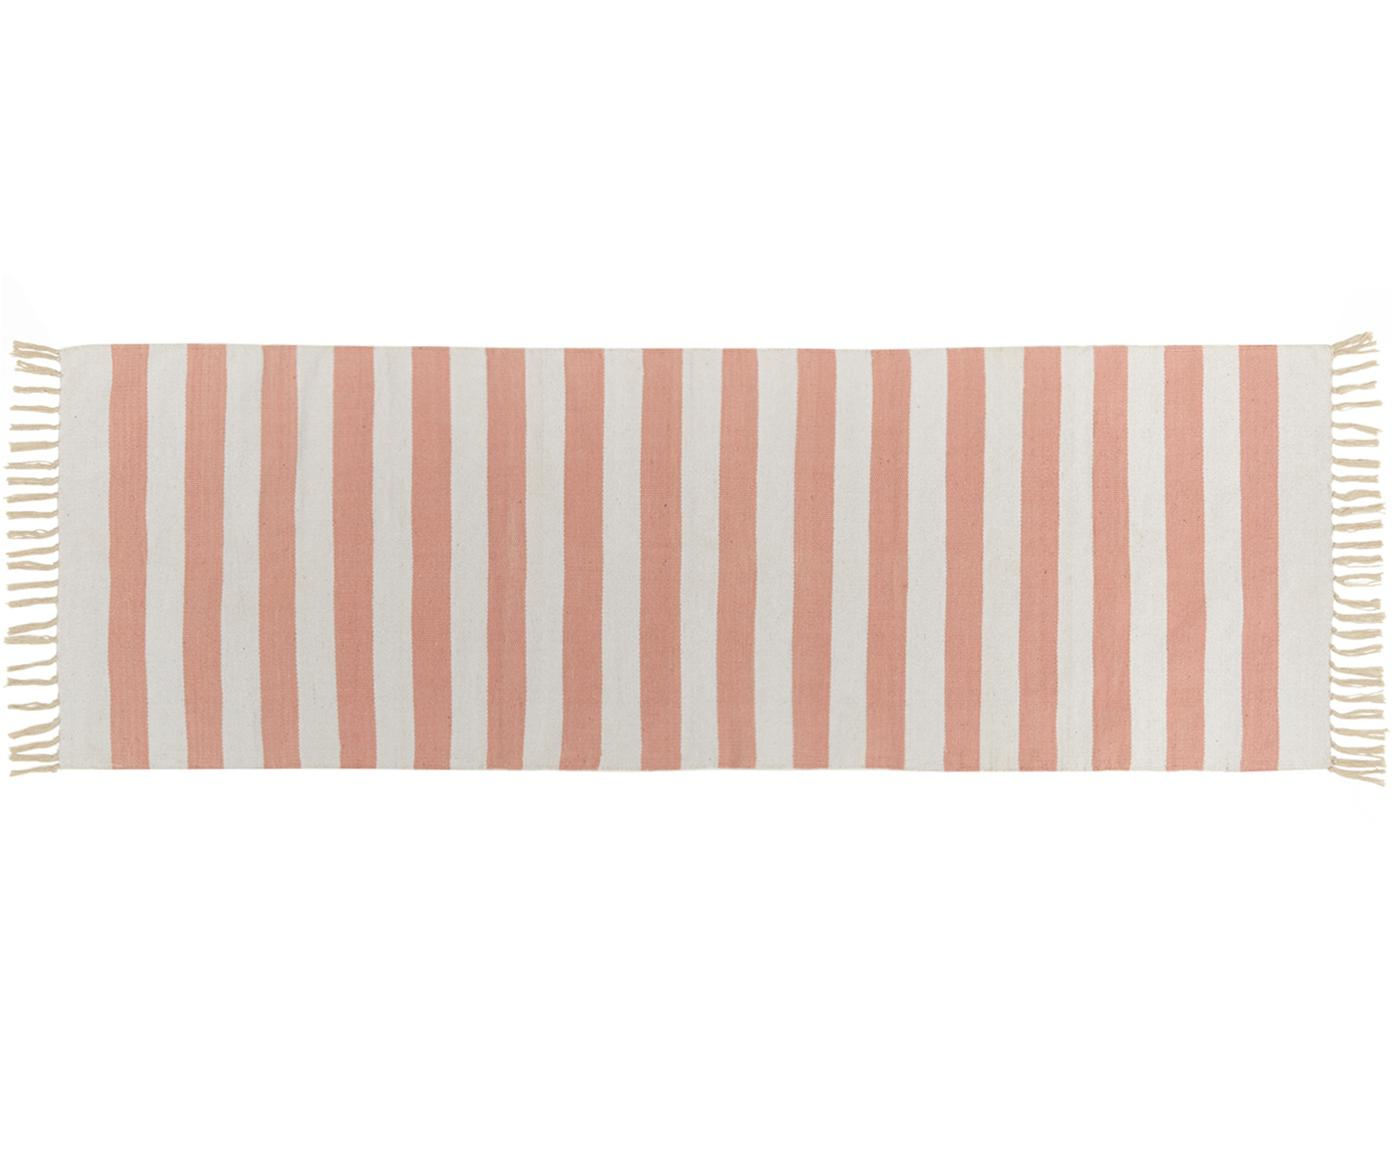 Runner a righe in rosa / bianco Malte, Rosso corallo, bianco, Larg. 70 x Lung. 200 cm